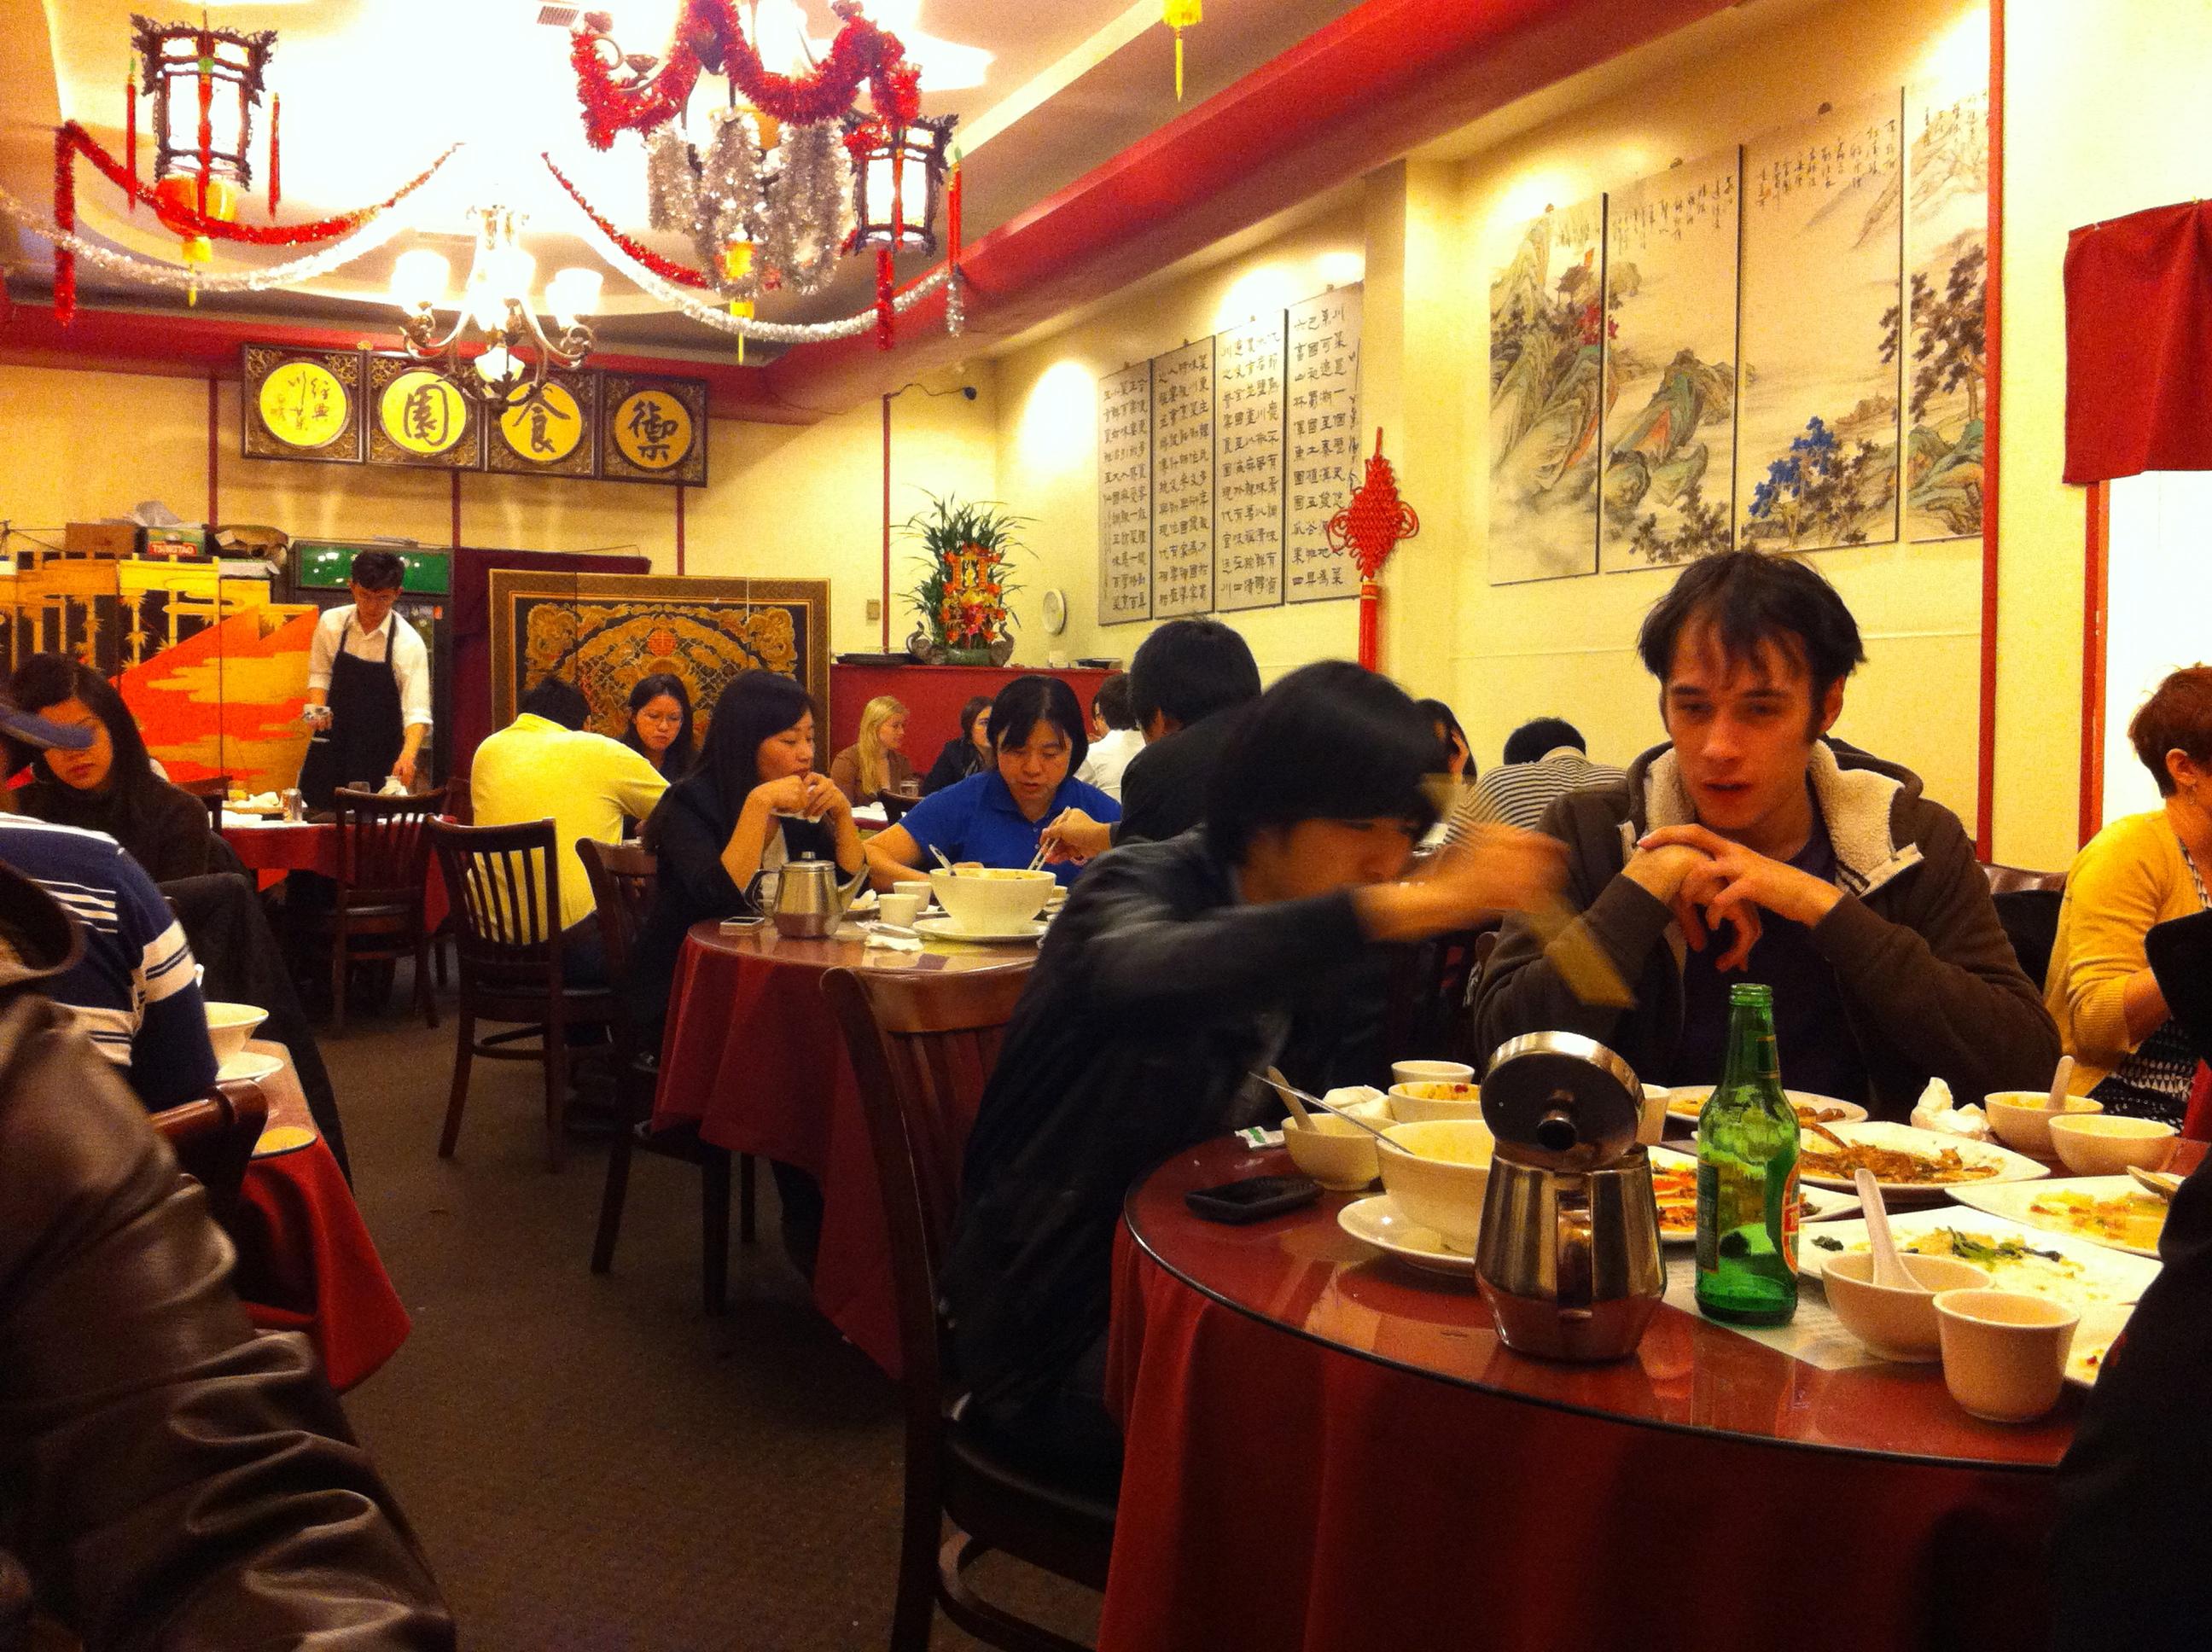 Z&Y Restaurant, Chinatown, San Francisco